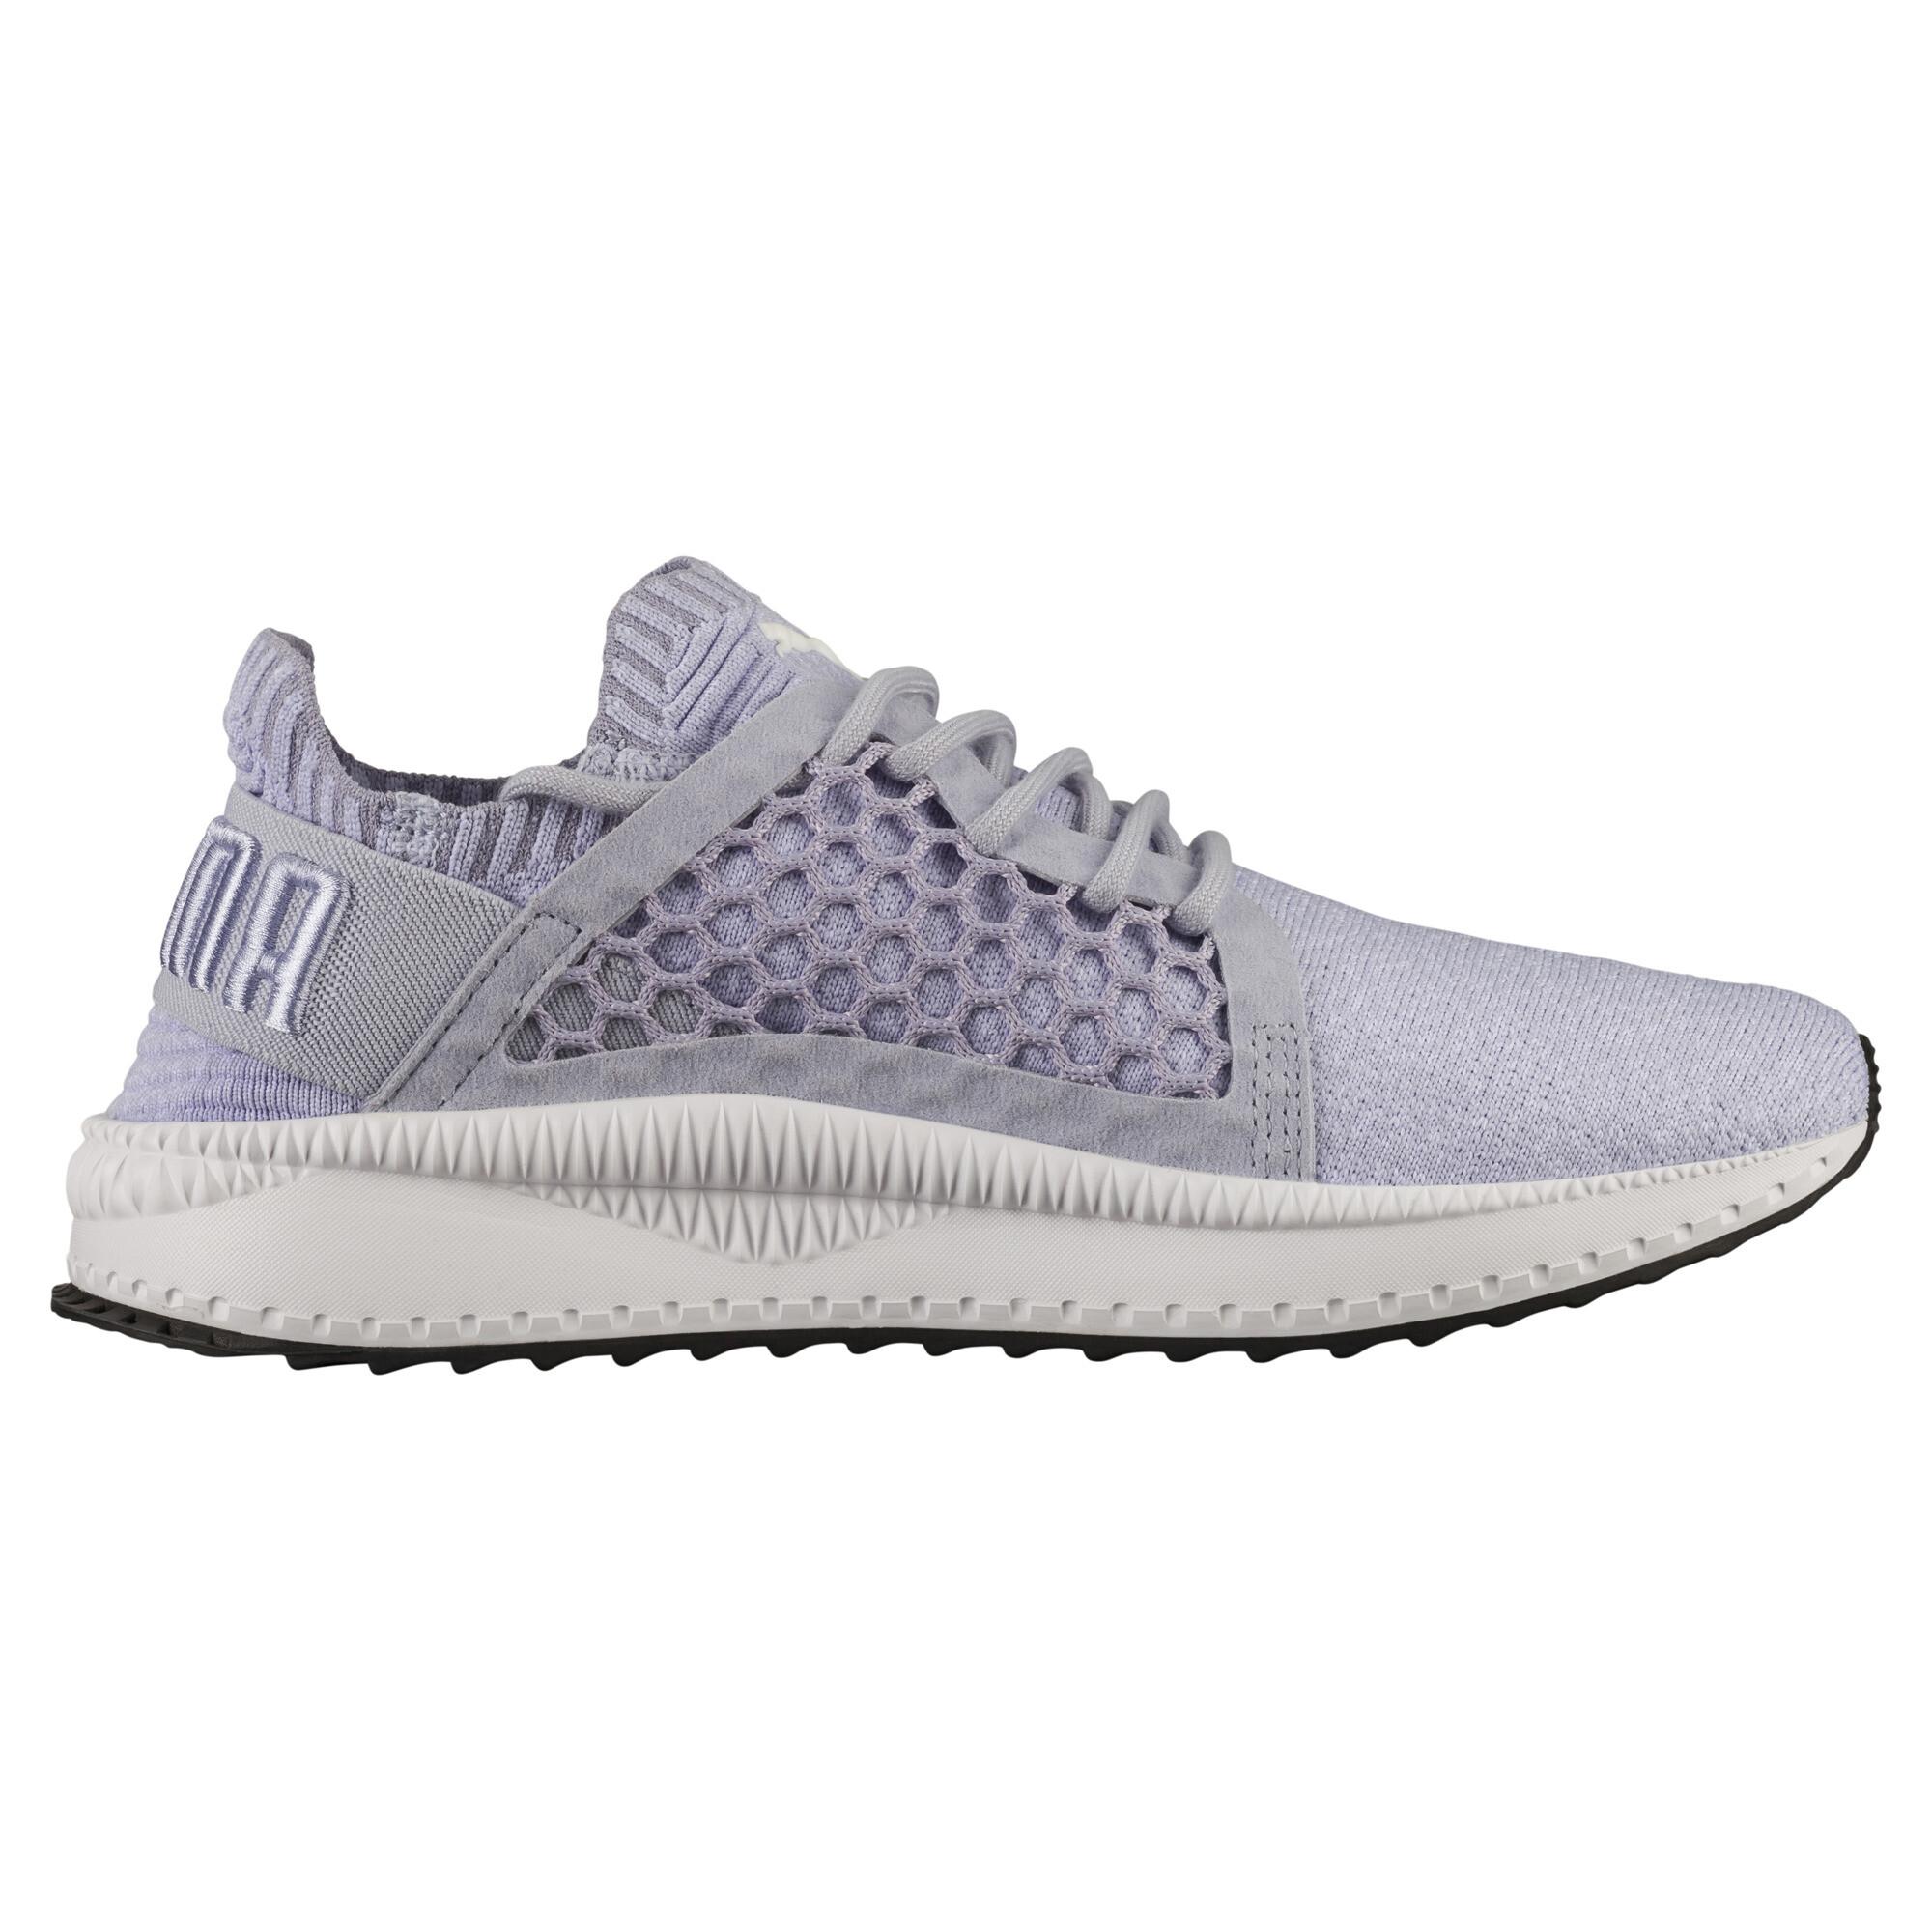 PUMA-TSUGI-NETFIT-evoKNIT-Sneaker-Frauen-Schuhe-Neu Indexbild 5